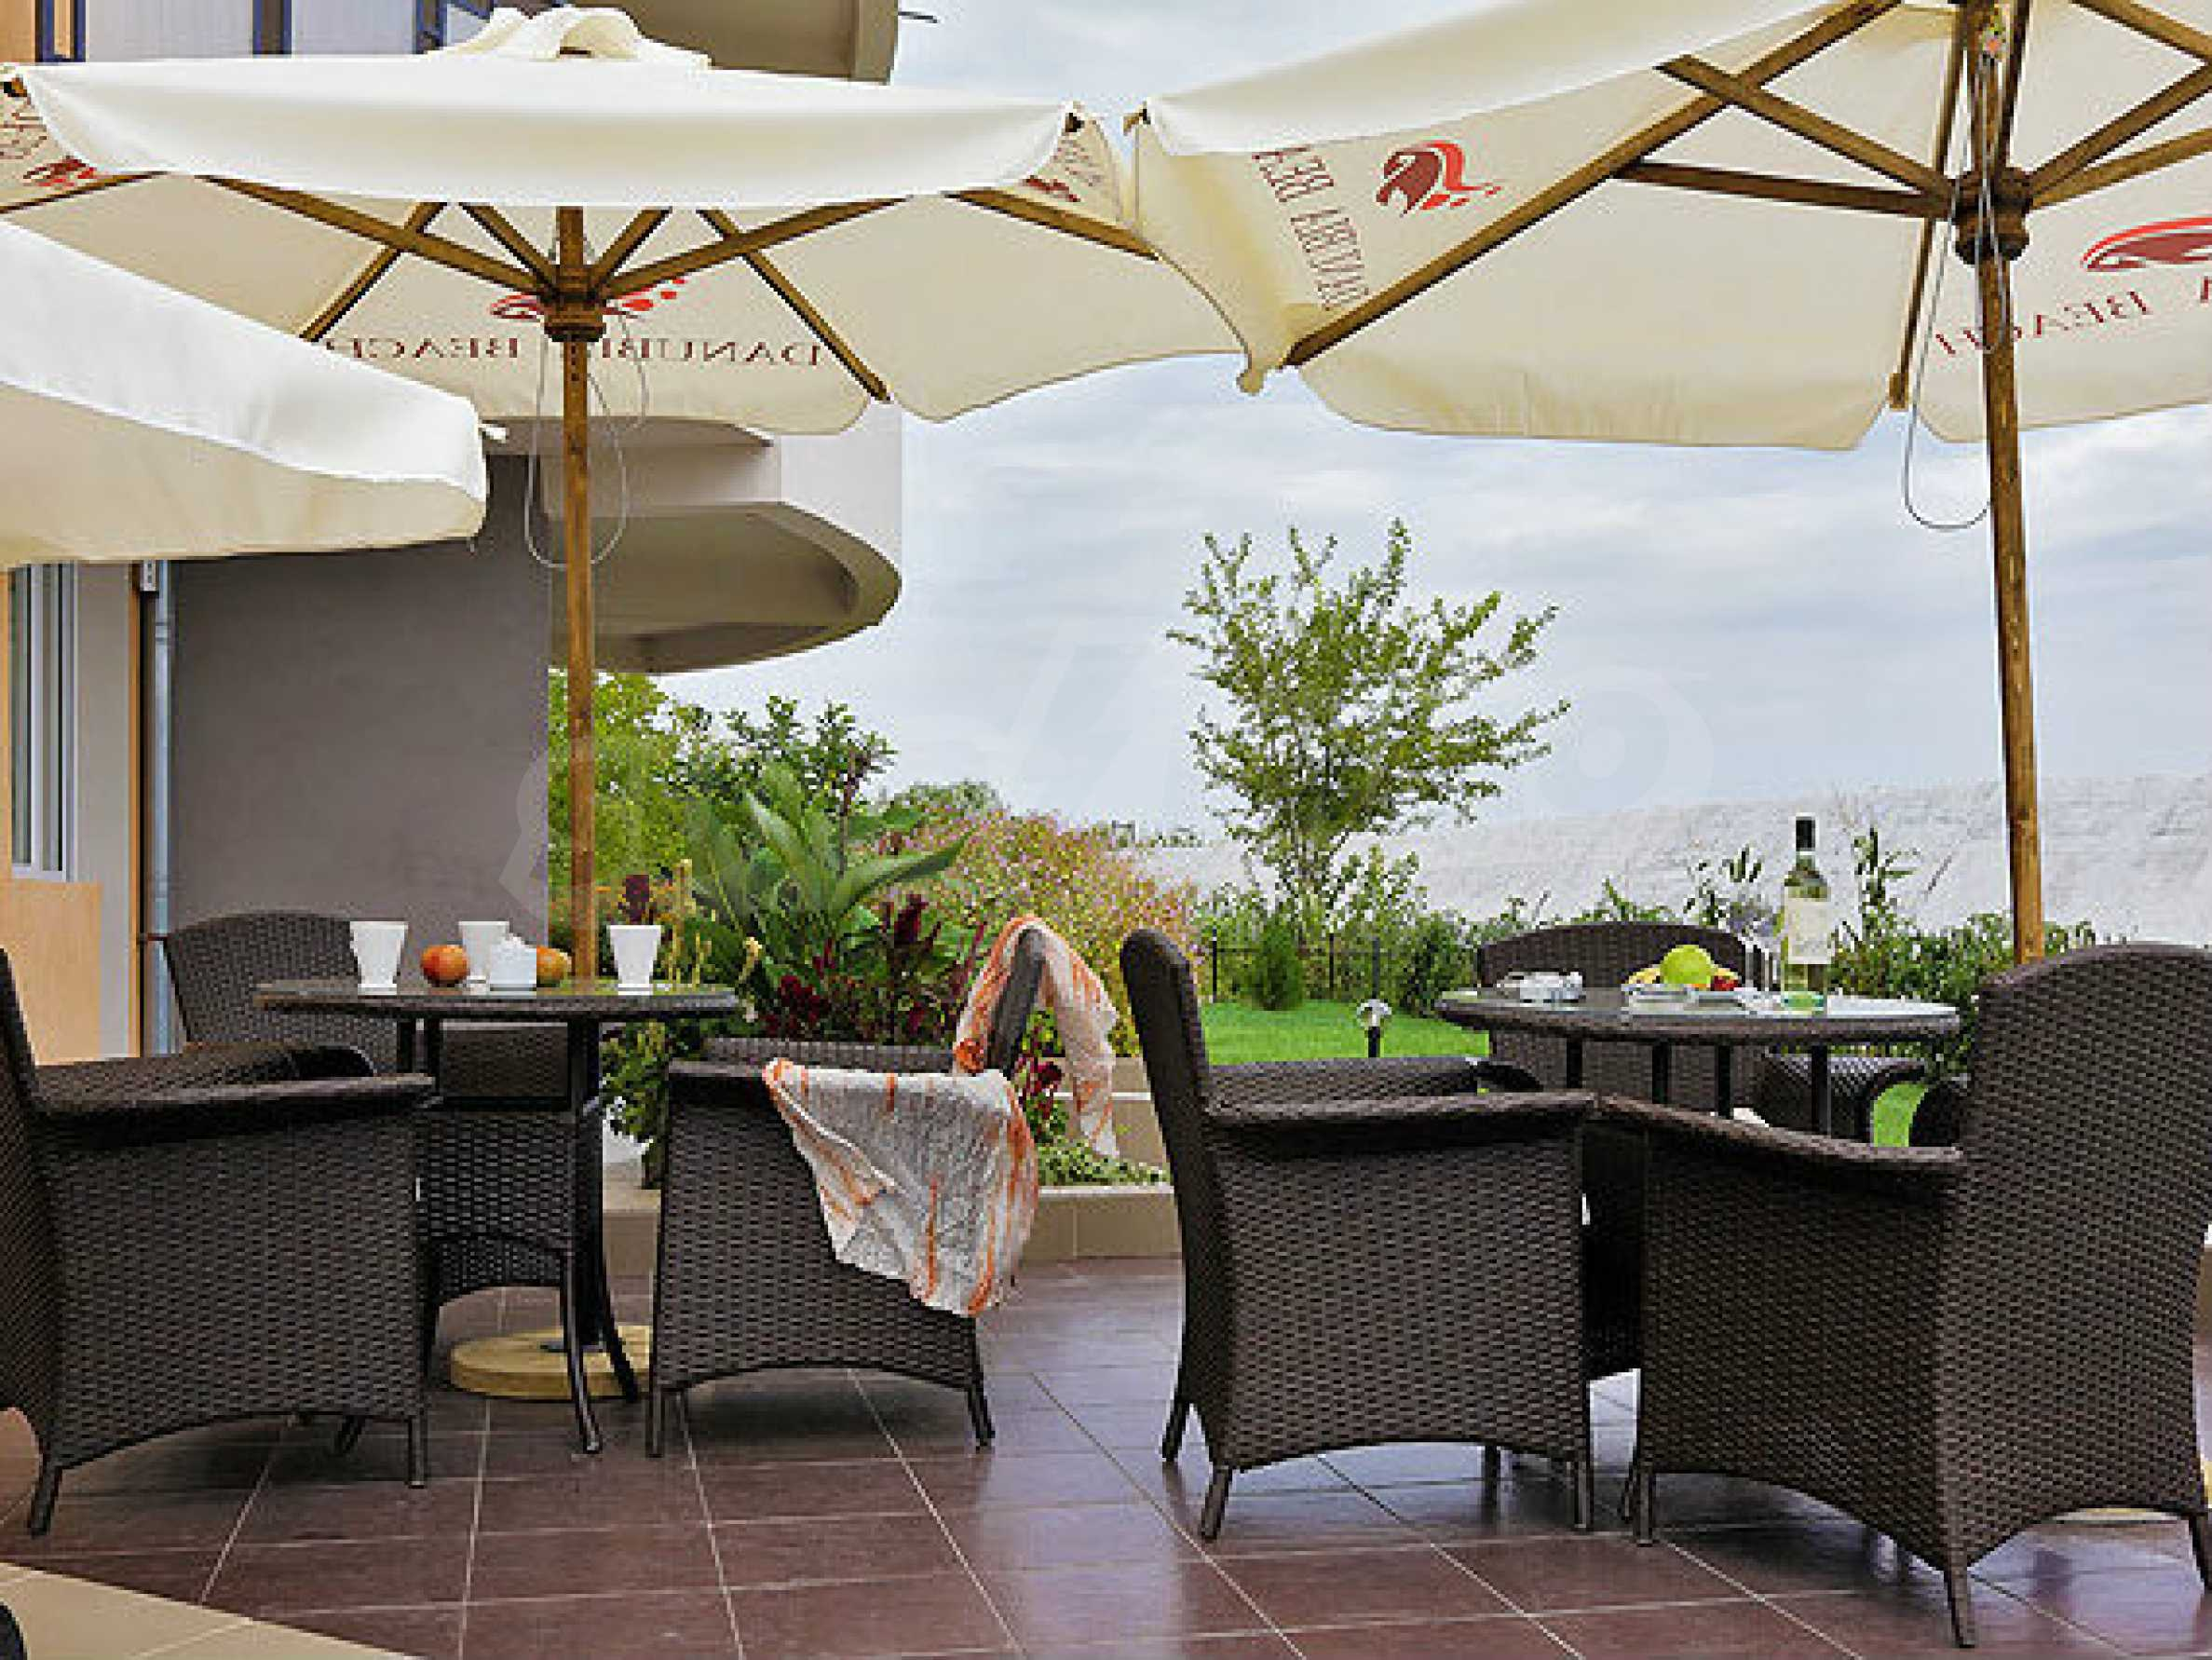 Coffee-bar with kitchen in Danubia Beach near Vidin and the Danube 16